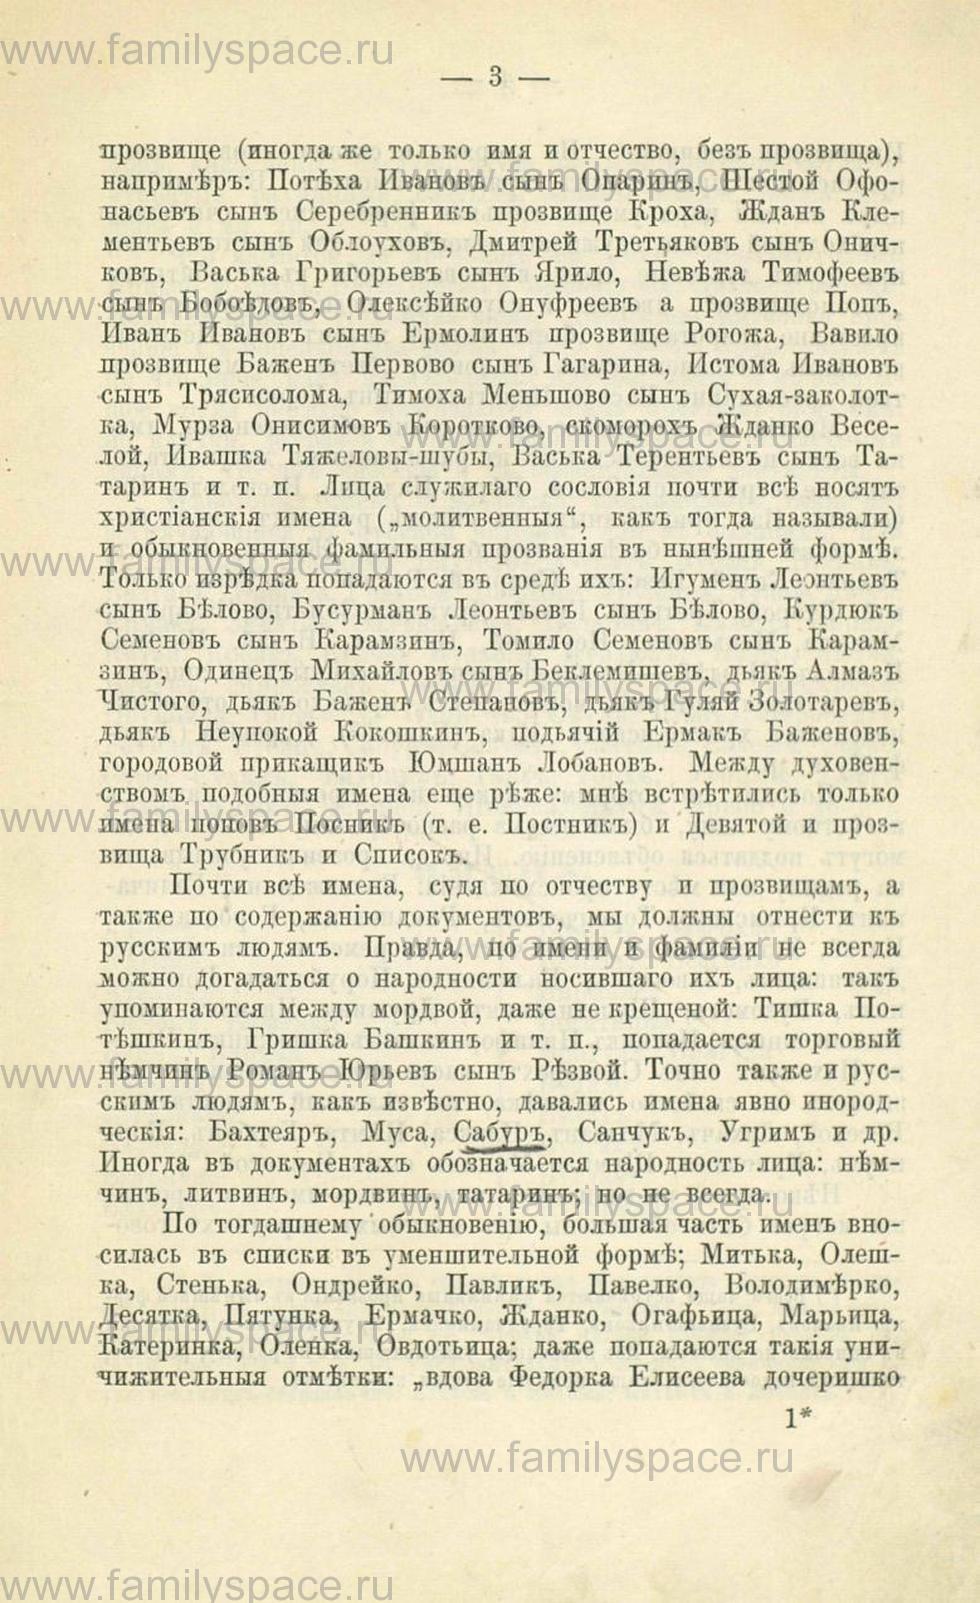 Поиск по фамилии - Русские имена и прозвища в 17 веке, страница 6